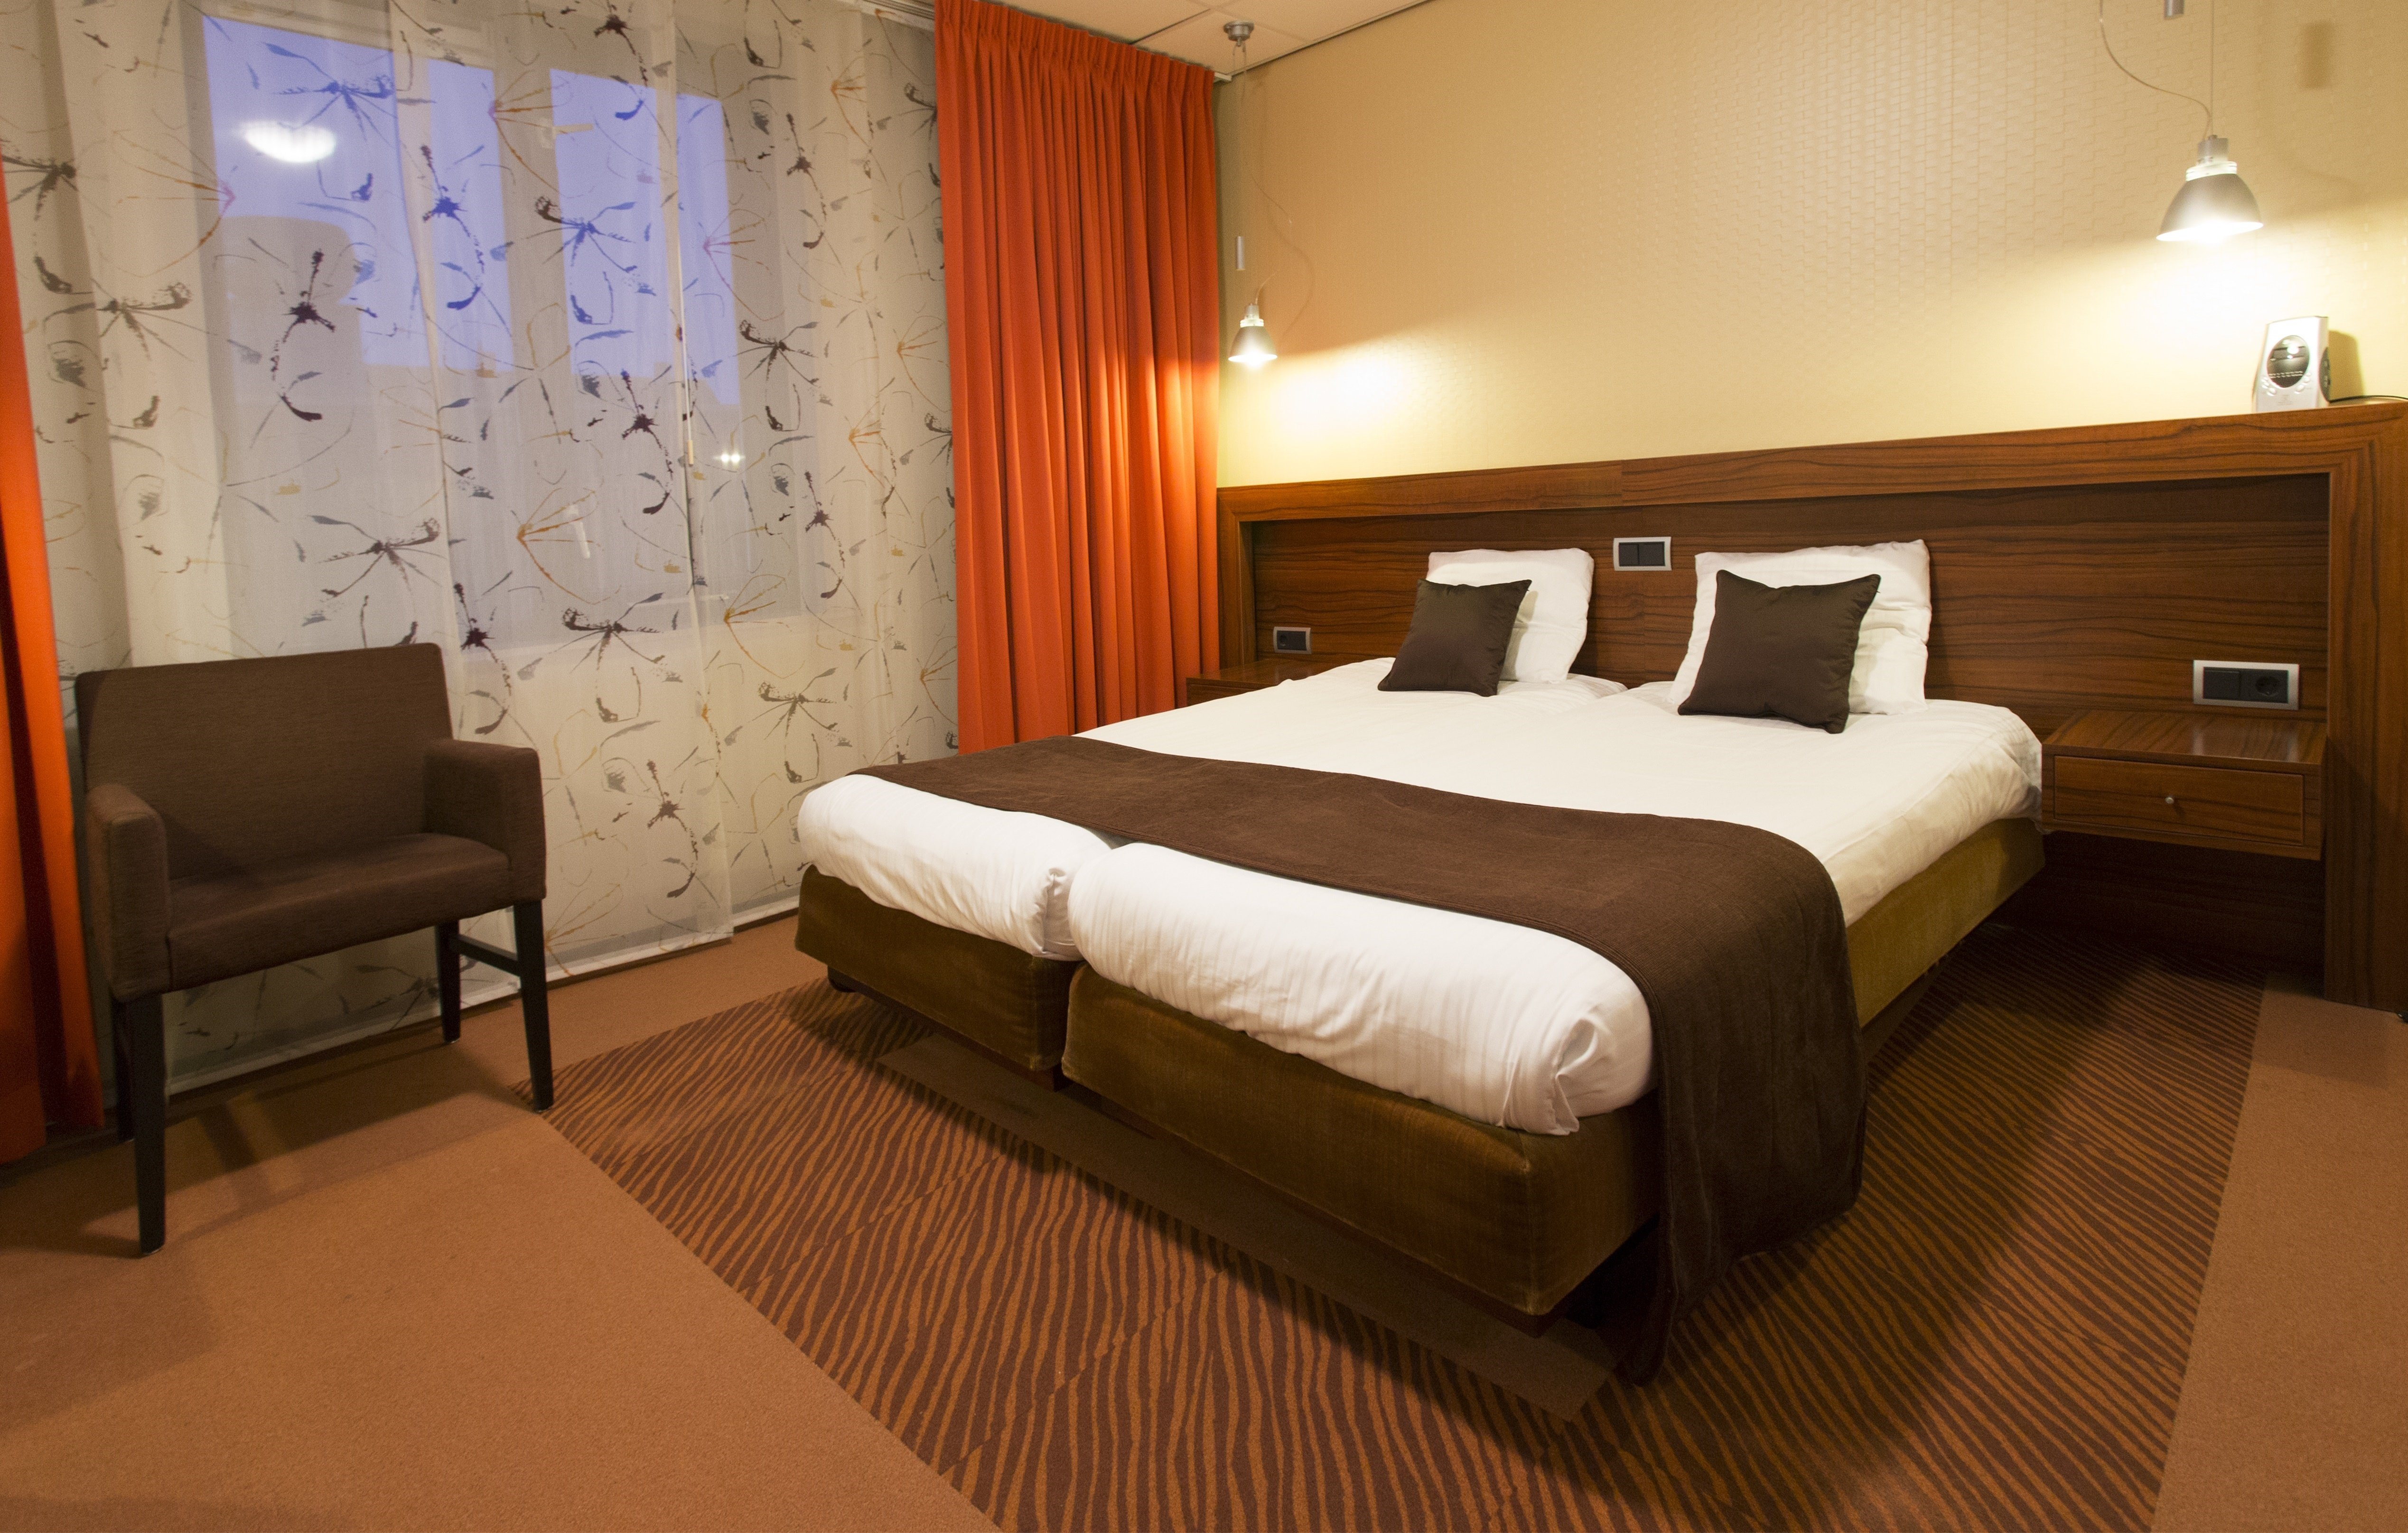 BEST WESTERN Hotel Restaurant Talens Coevorden